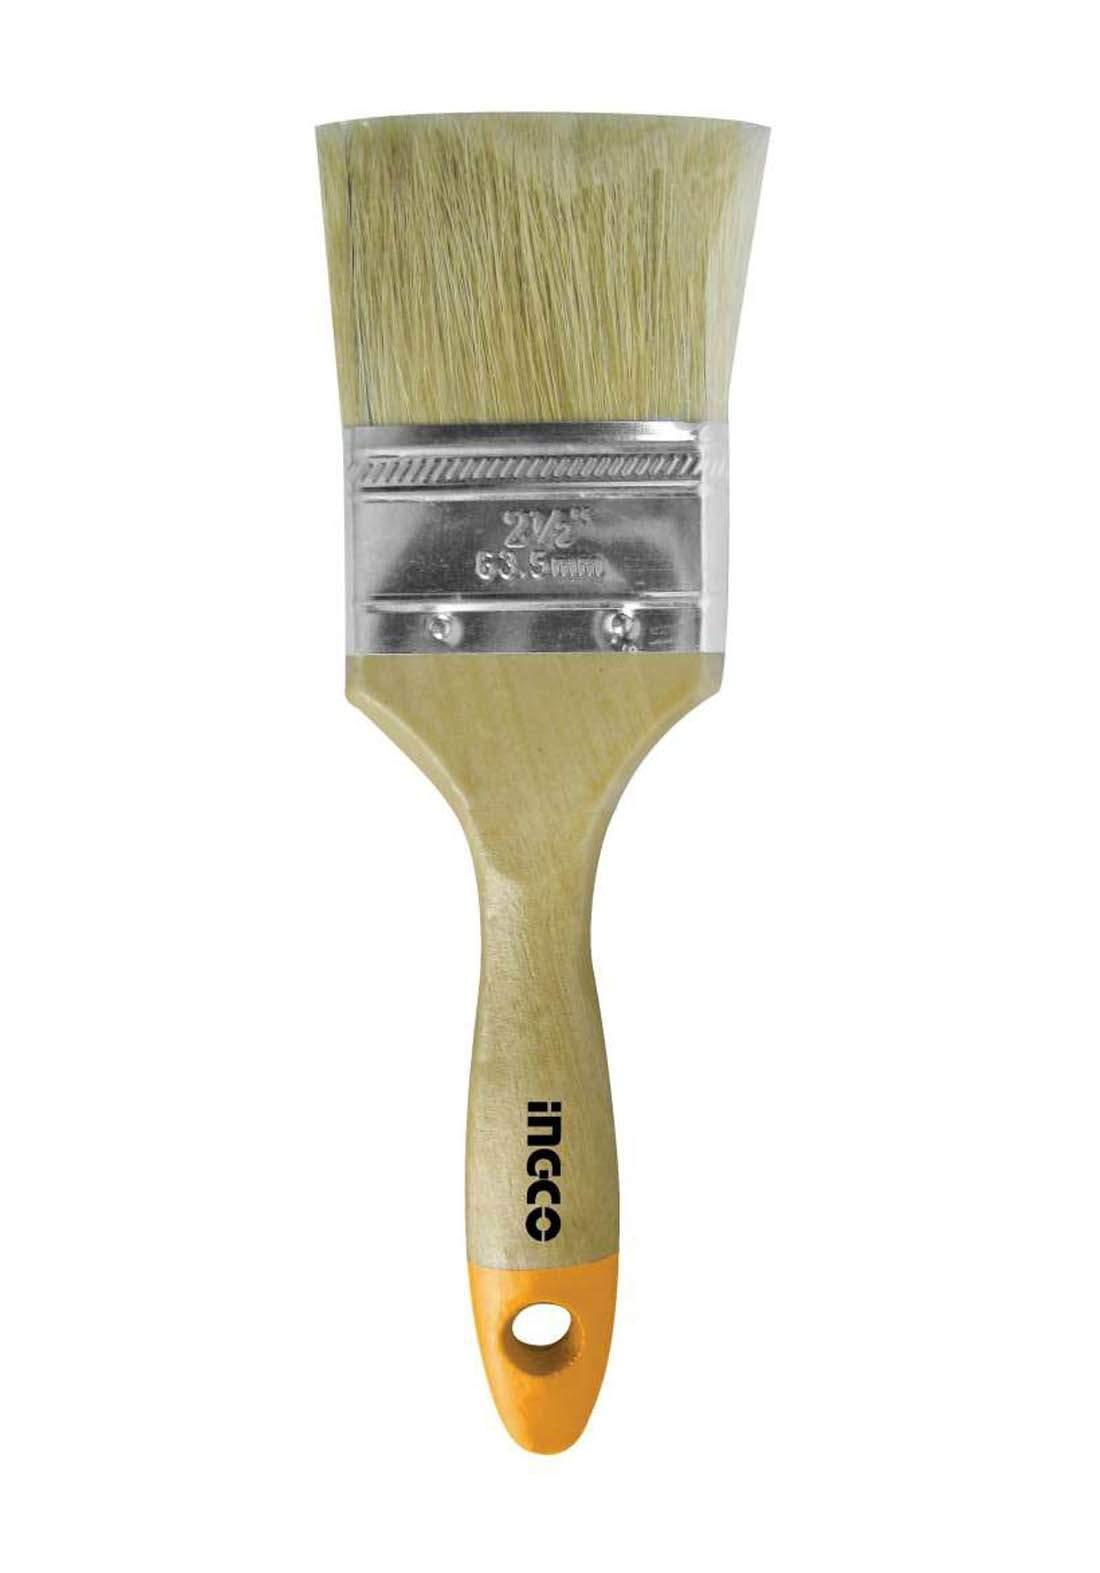 "Ingco CHPTB0104 Dye brush 4"" فرشاة صبغ 4 انج"